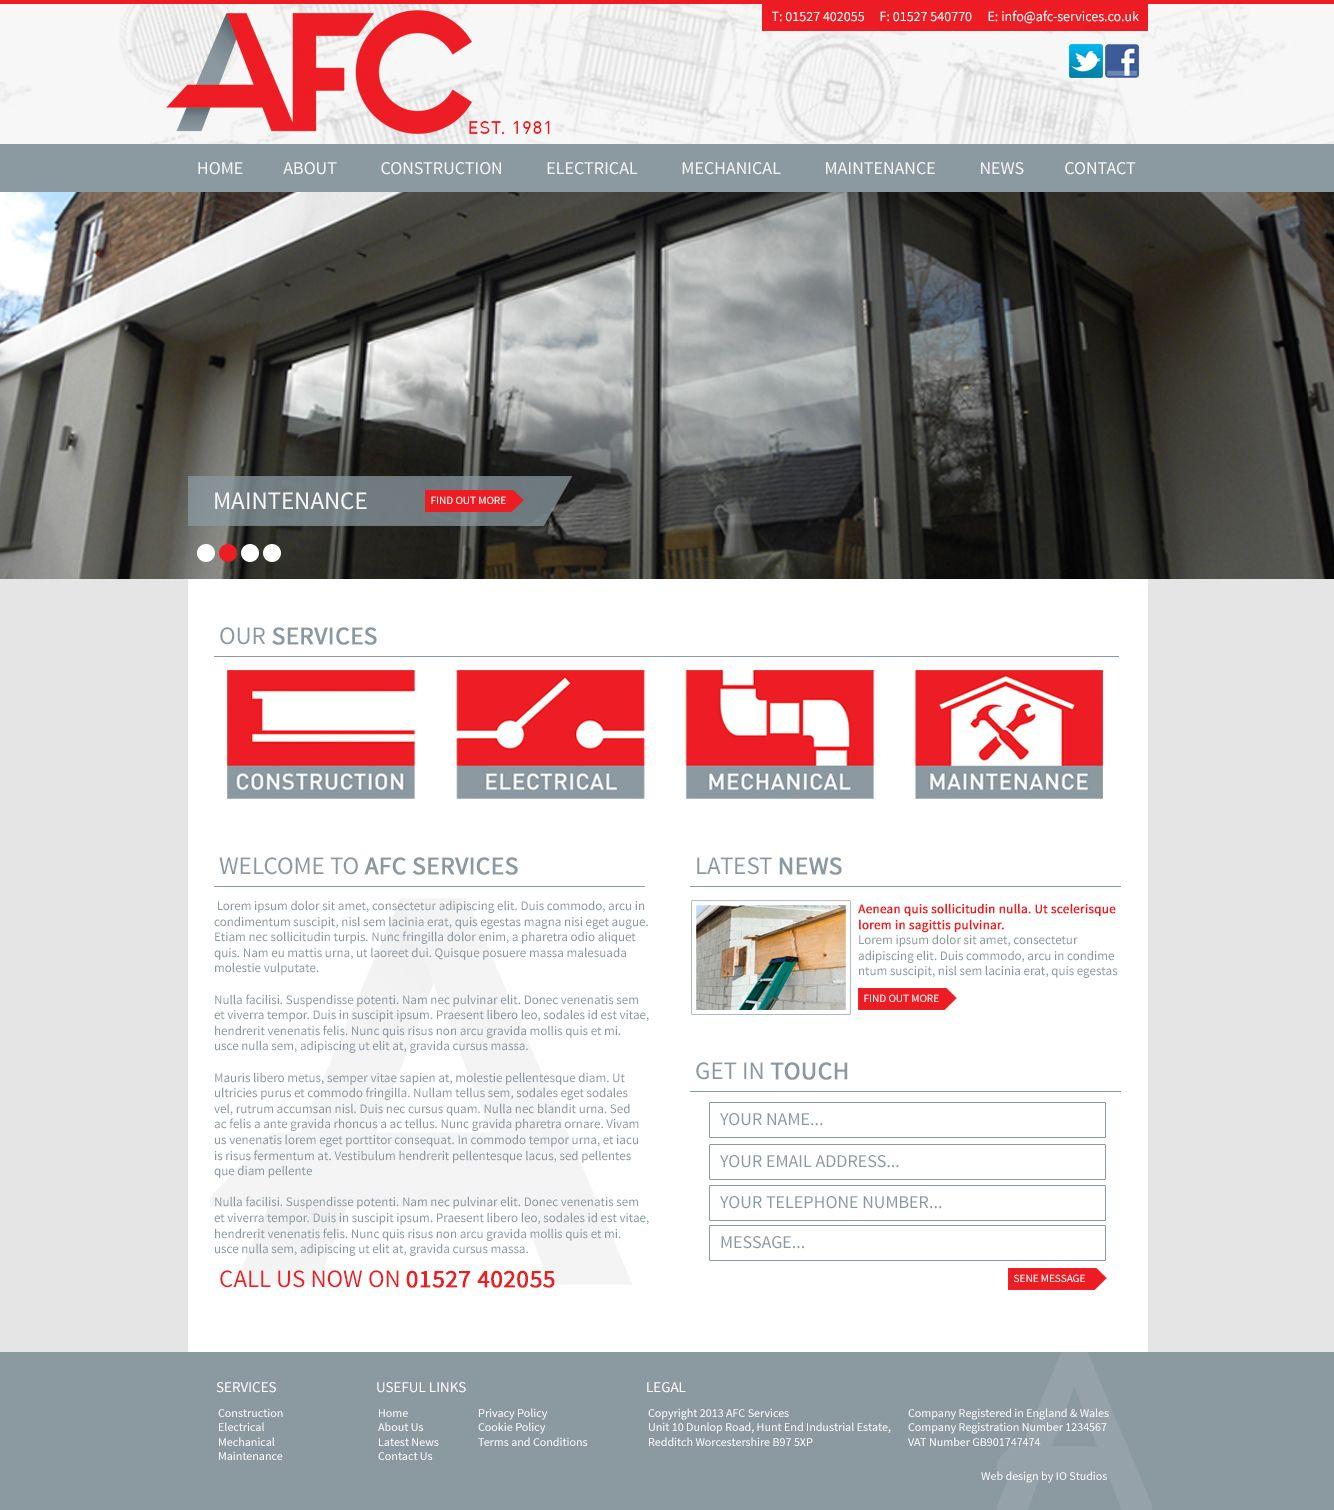 Afc Services Construction And M E Contractors In Redditch Birmingham Midlands Midlands Contractors Construction